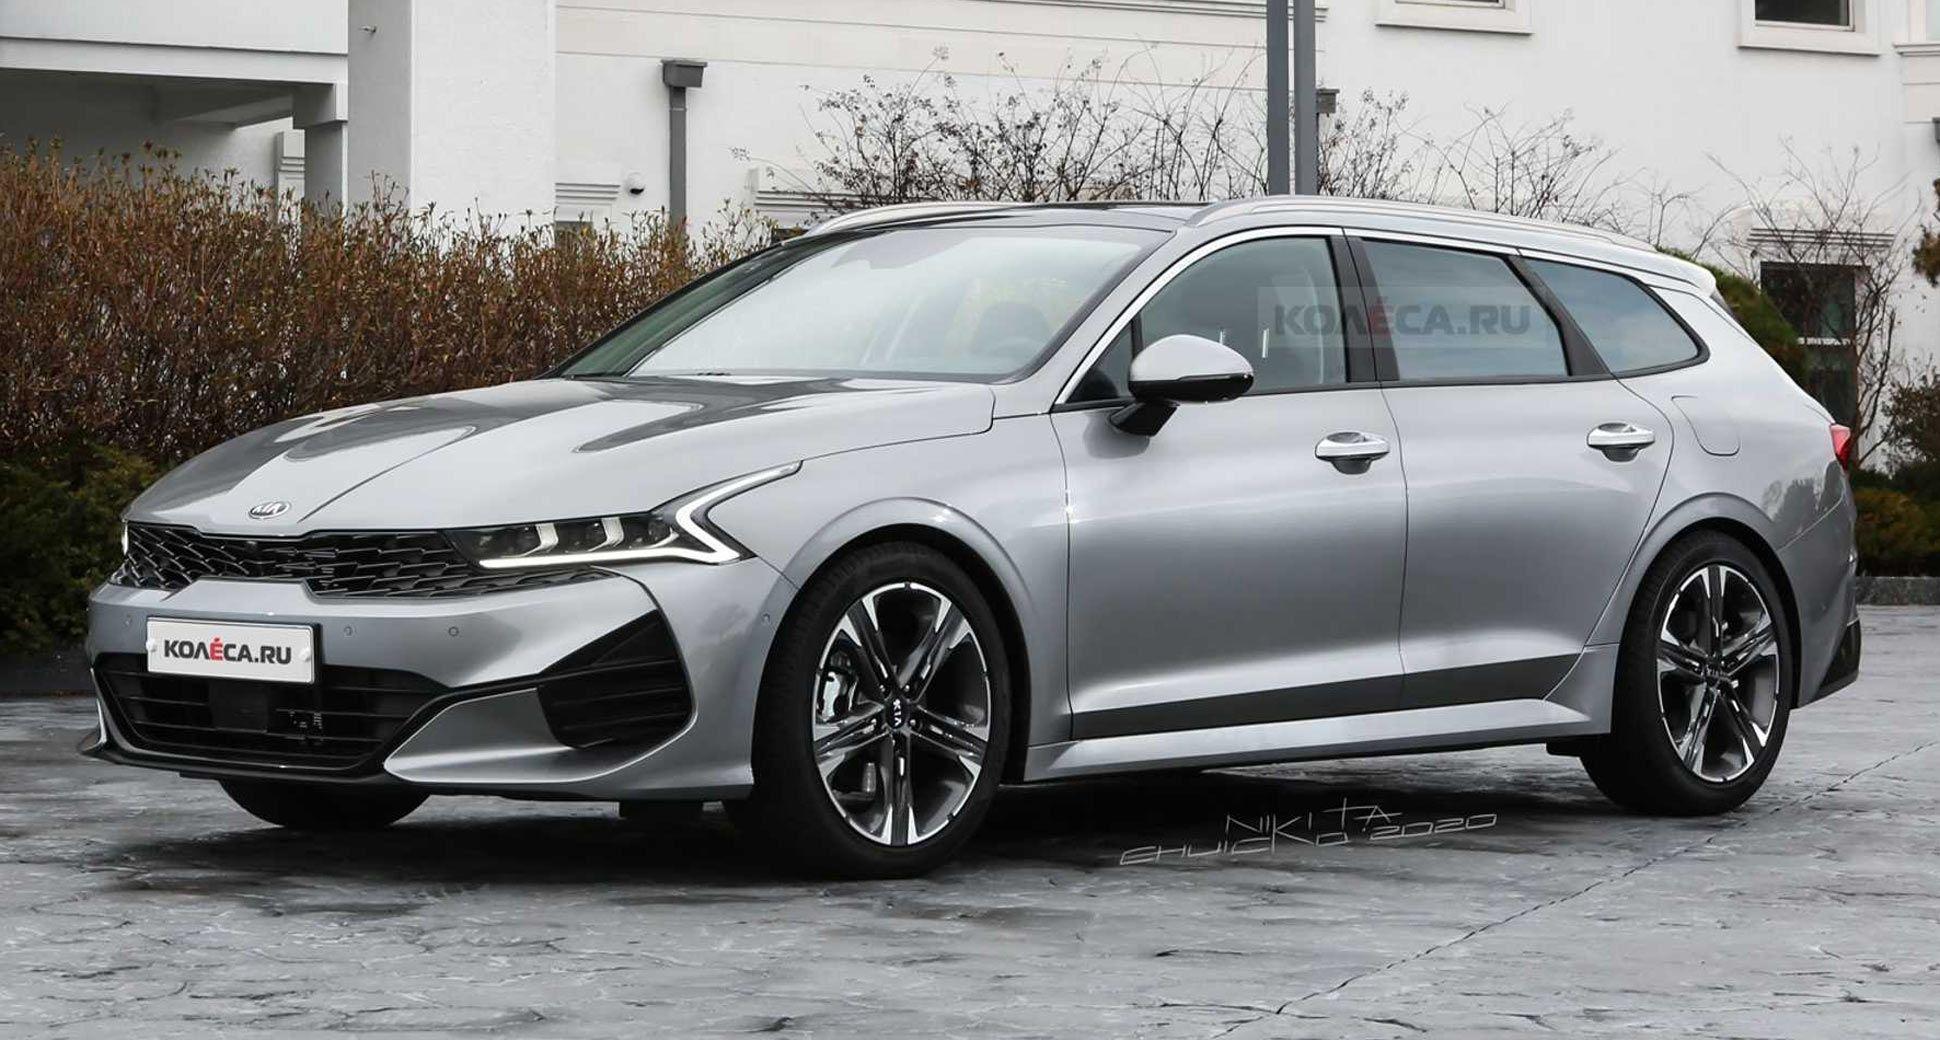 New 2021 Kia Optima K5 Looks Seductive As A Sports Wagon Kia Kiak5 Kiaoptima Renderings Cars Carsofinstagram Car In 2020 Sports Wagon Kia Optima Kia Optima K5